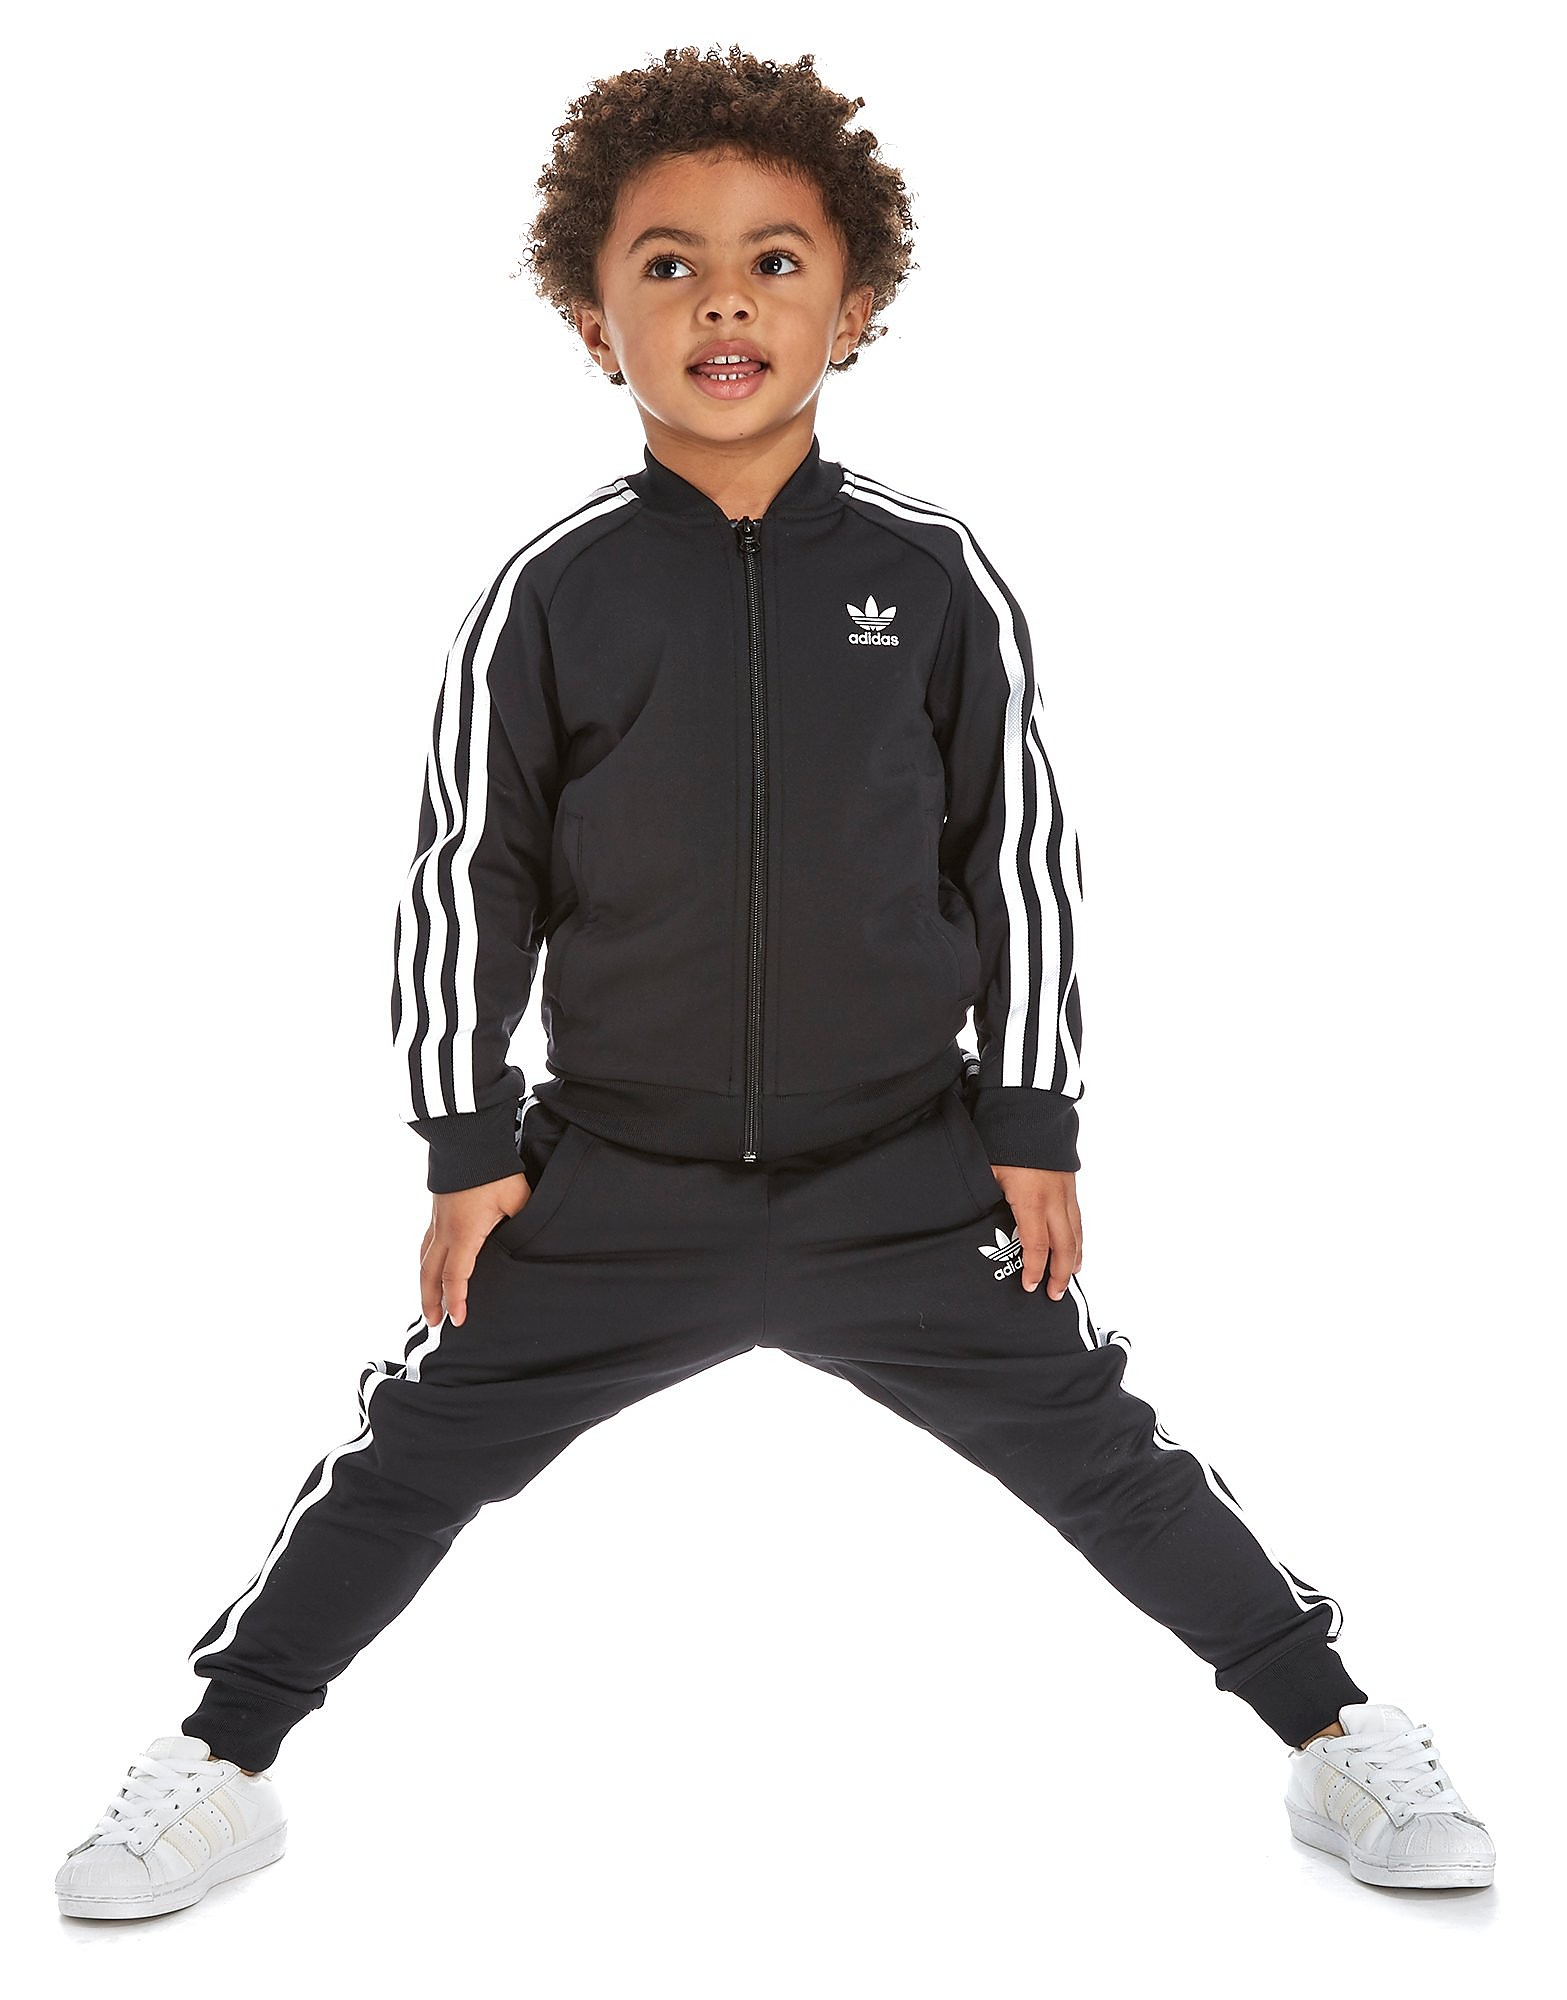 adidas Originals Superstar Trainingsanzug Kinder